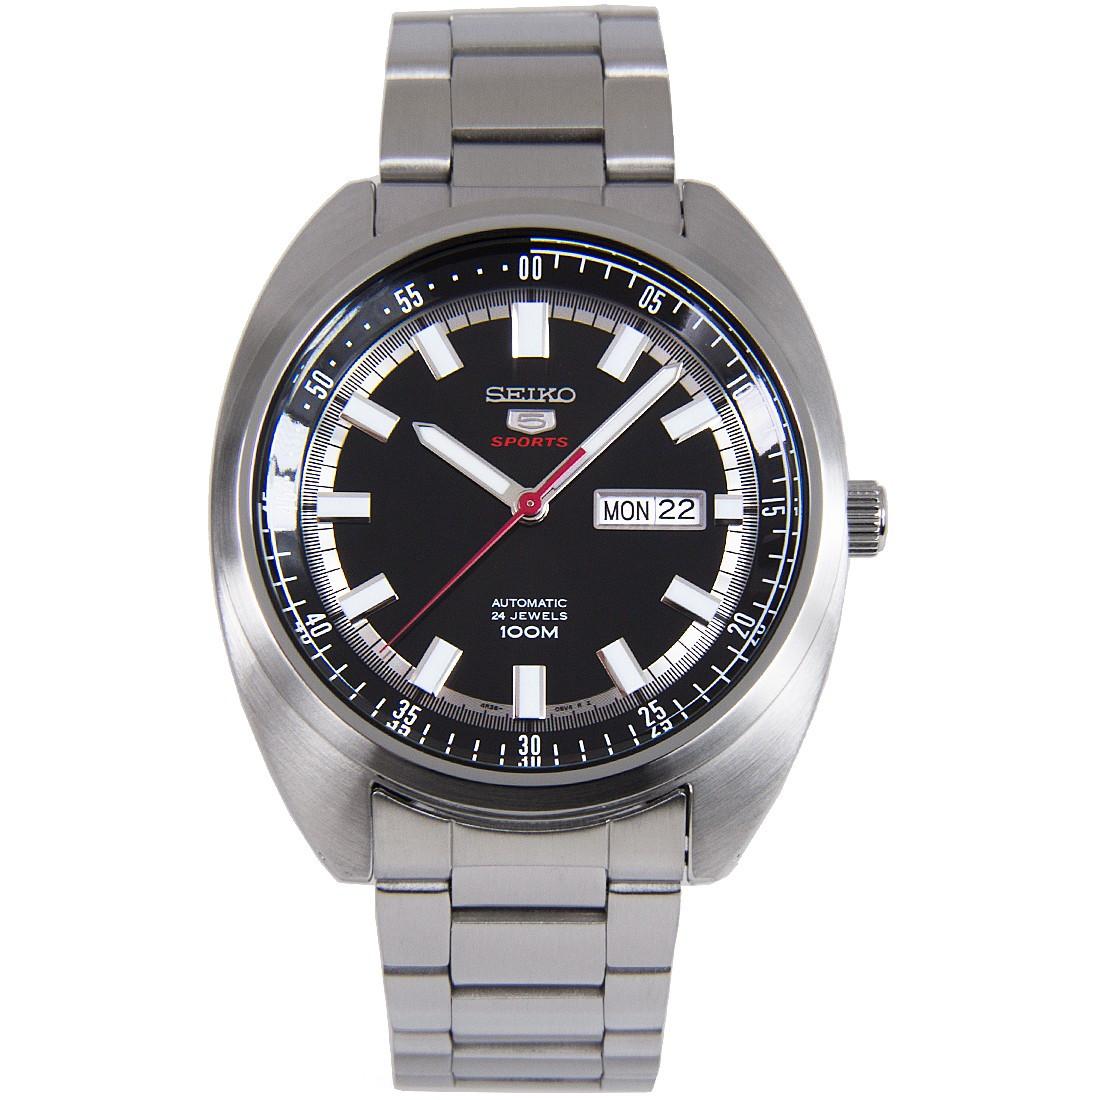 Часы Seiko 5 Sports SRPB19J1 Automatic 4R36